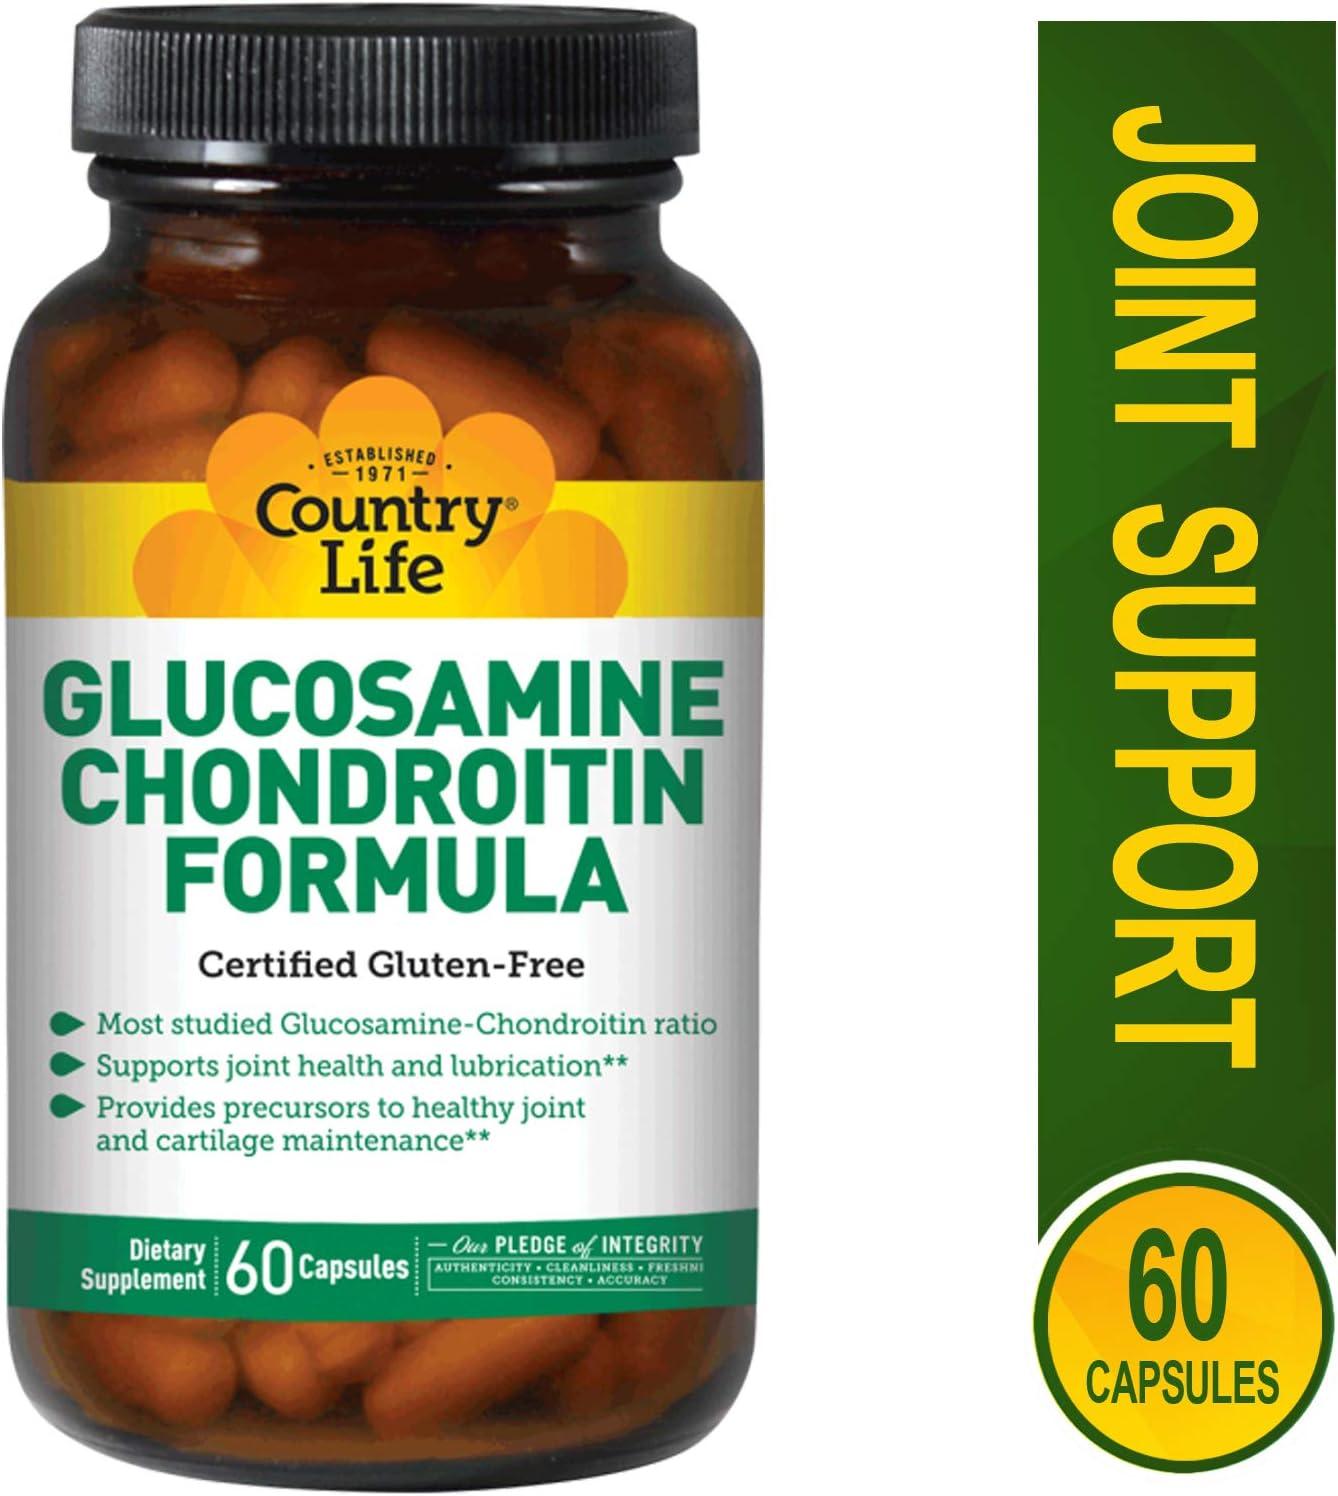 Country Life Glucosamine Chondroitin formula, 60 Capsules